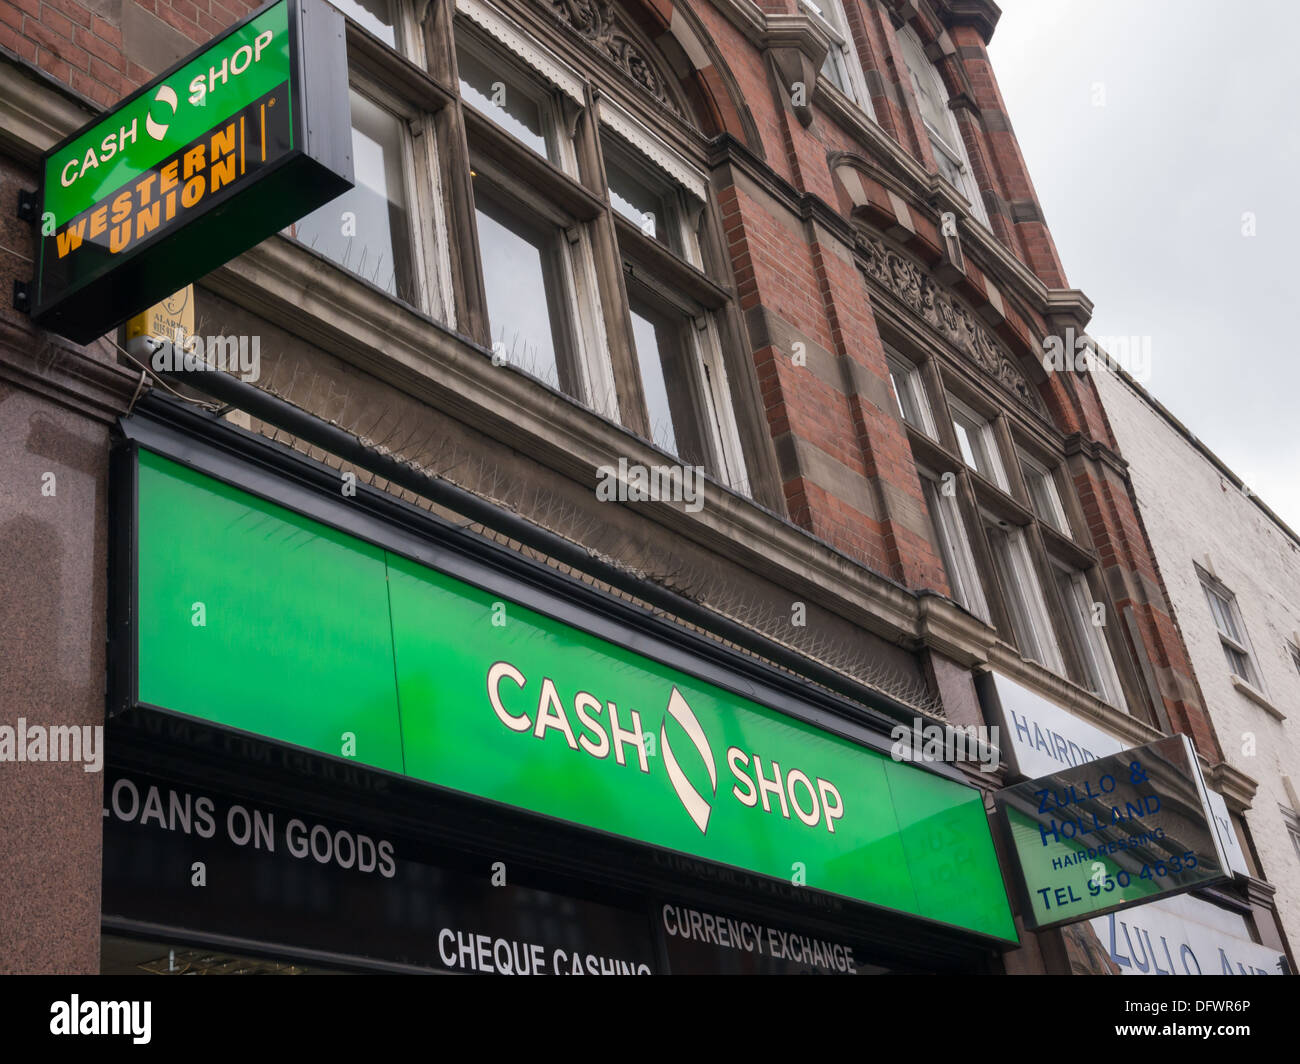 Cimb bank cash plus personal loan image 10